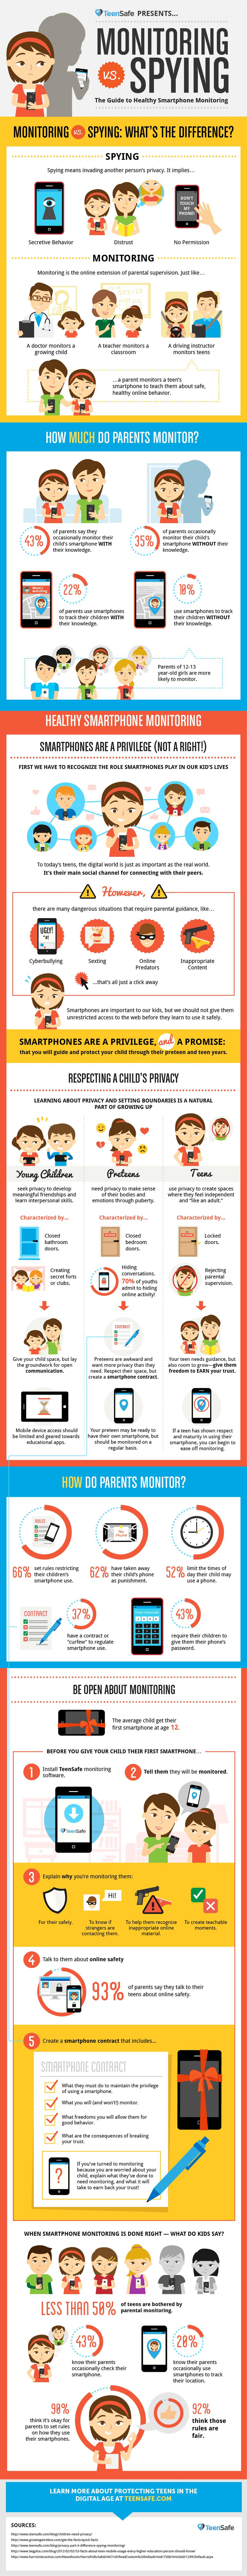 guia-padres-monitorizacion-smartphones-hijos